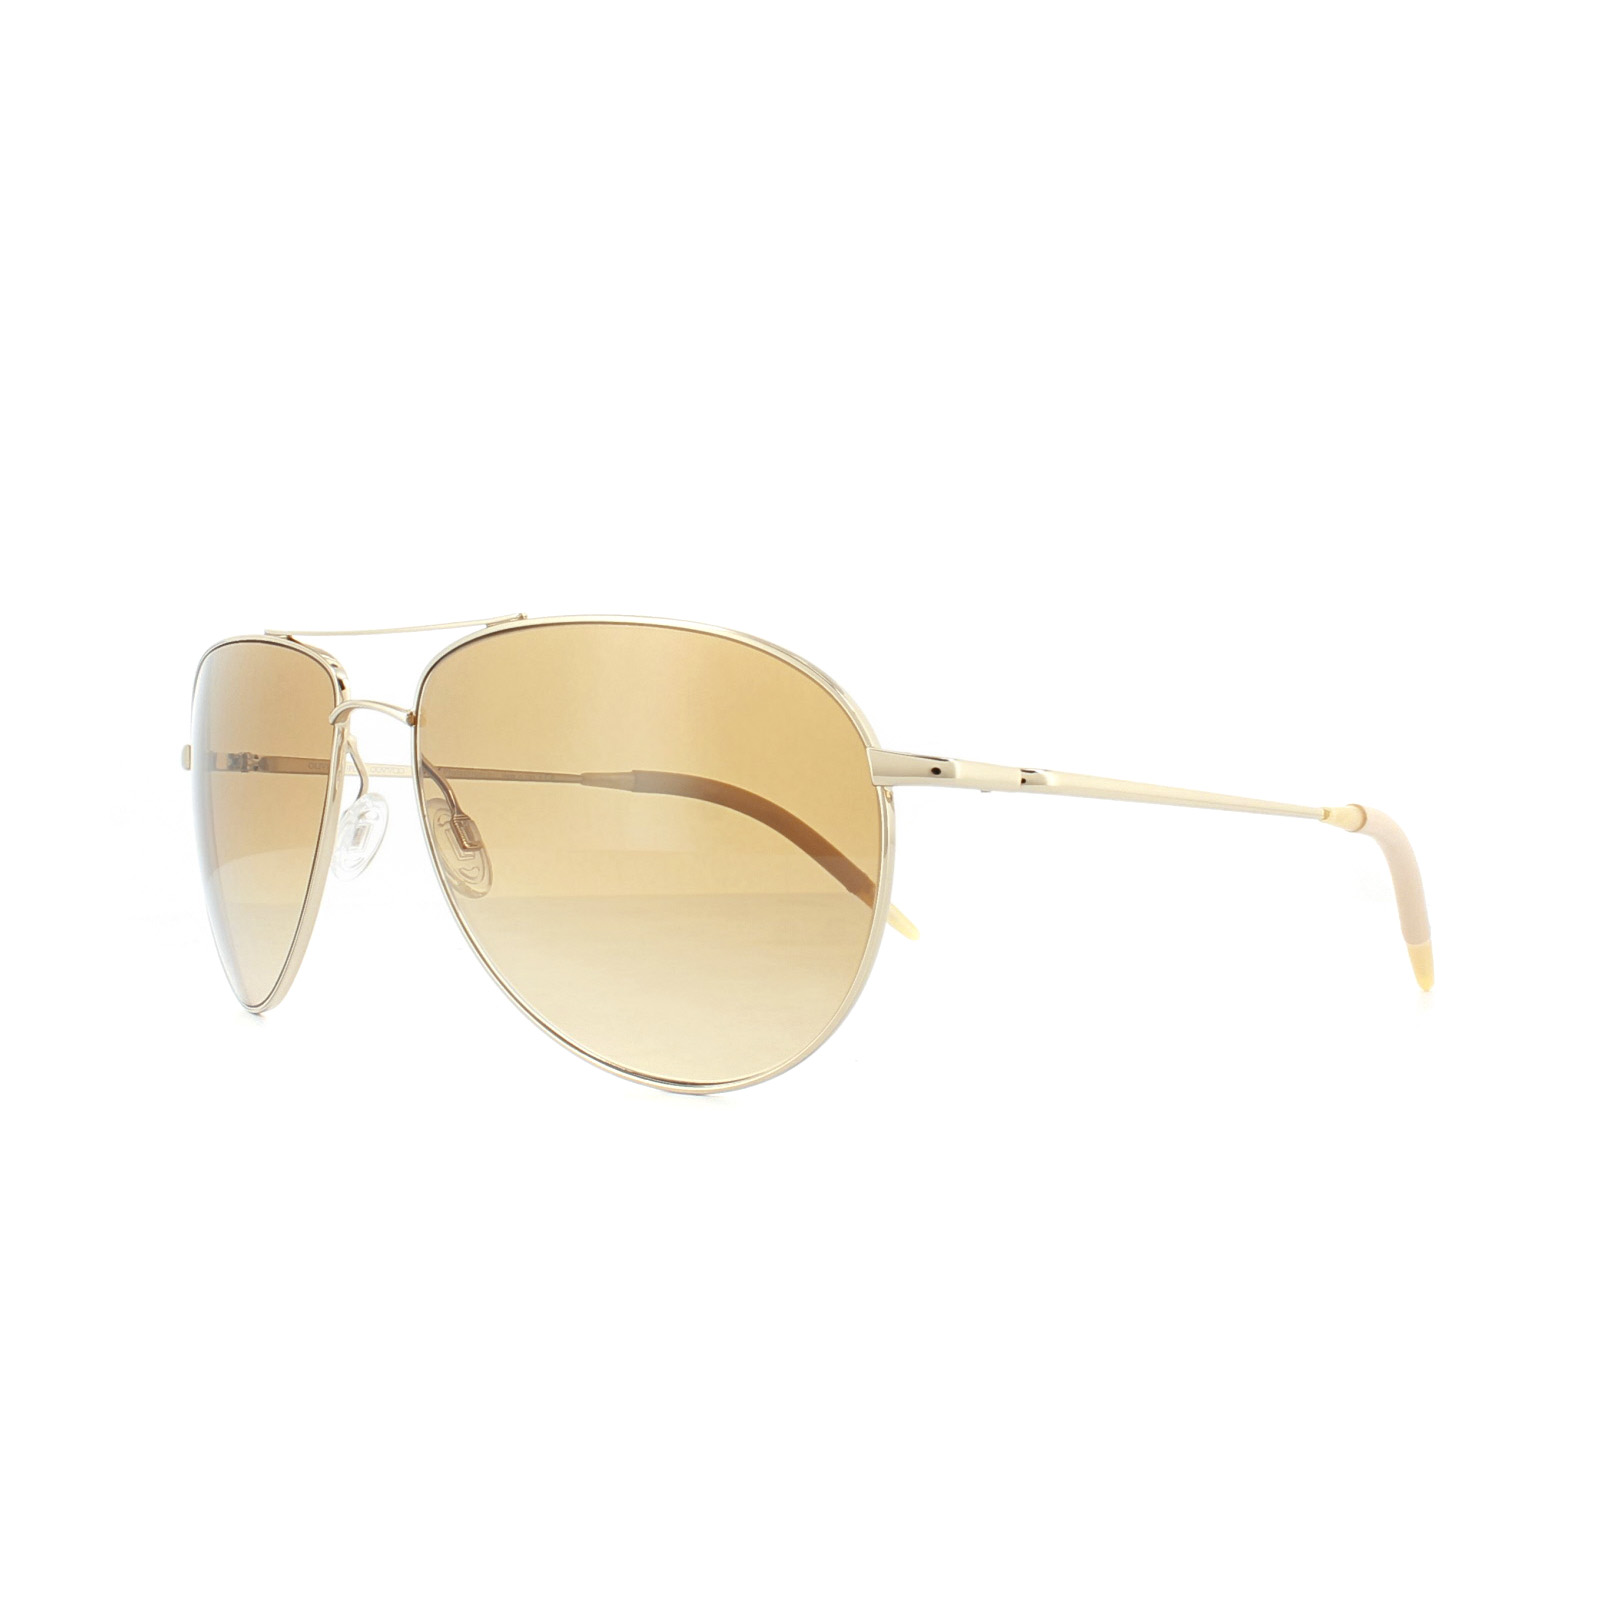 039492f3fb9 Sentinel Oliver Peoples Sunglasses Benedict 1002 524251 Gold Amber VFX 62mm